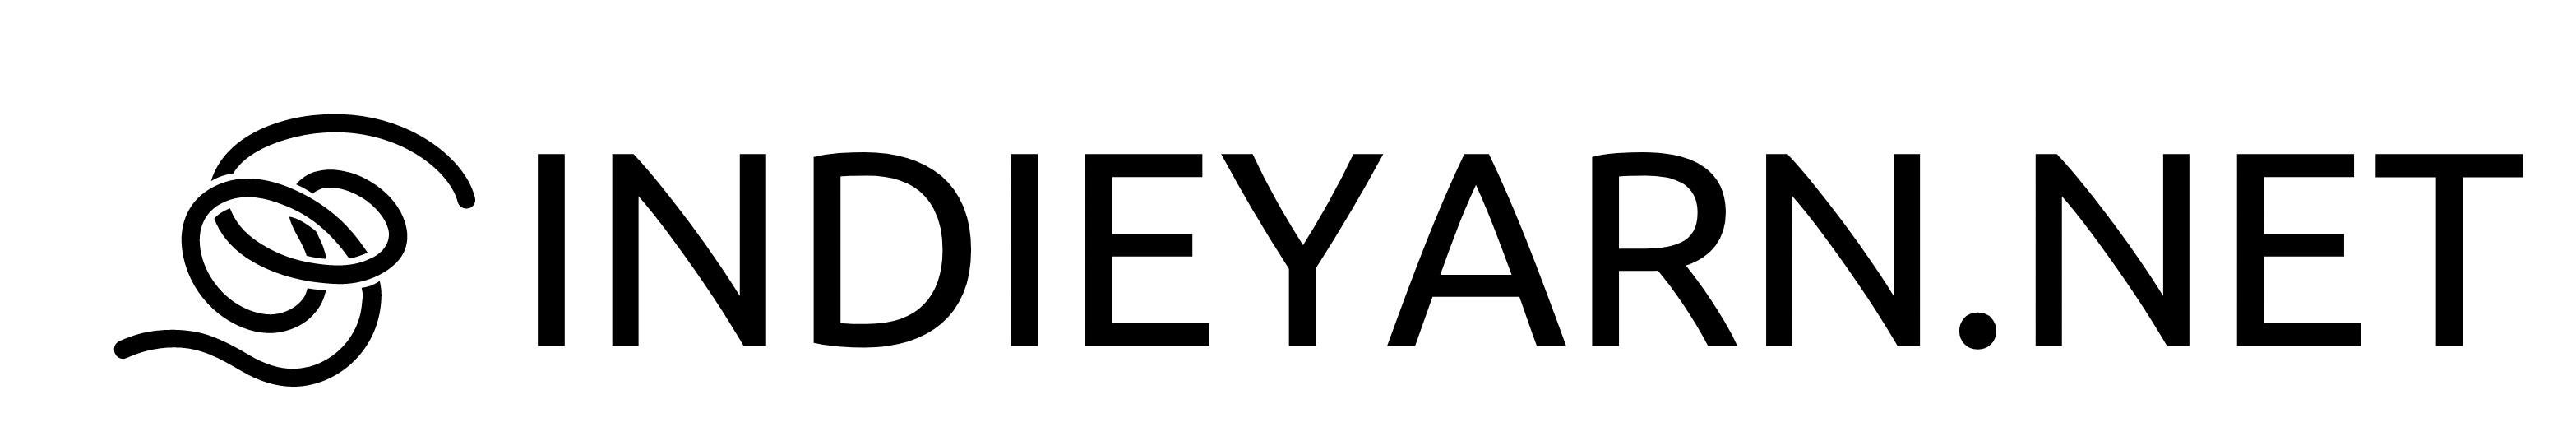 Independent Yarn Network